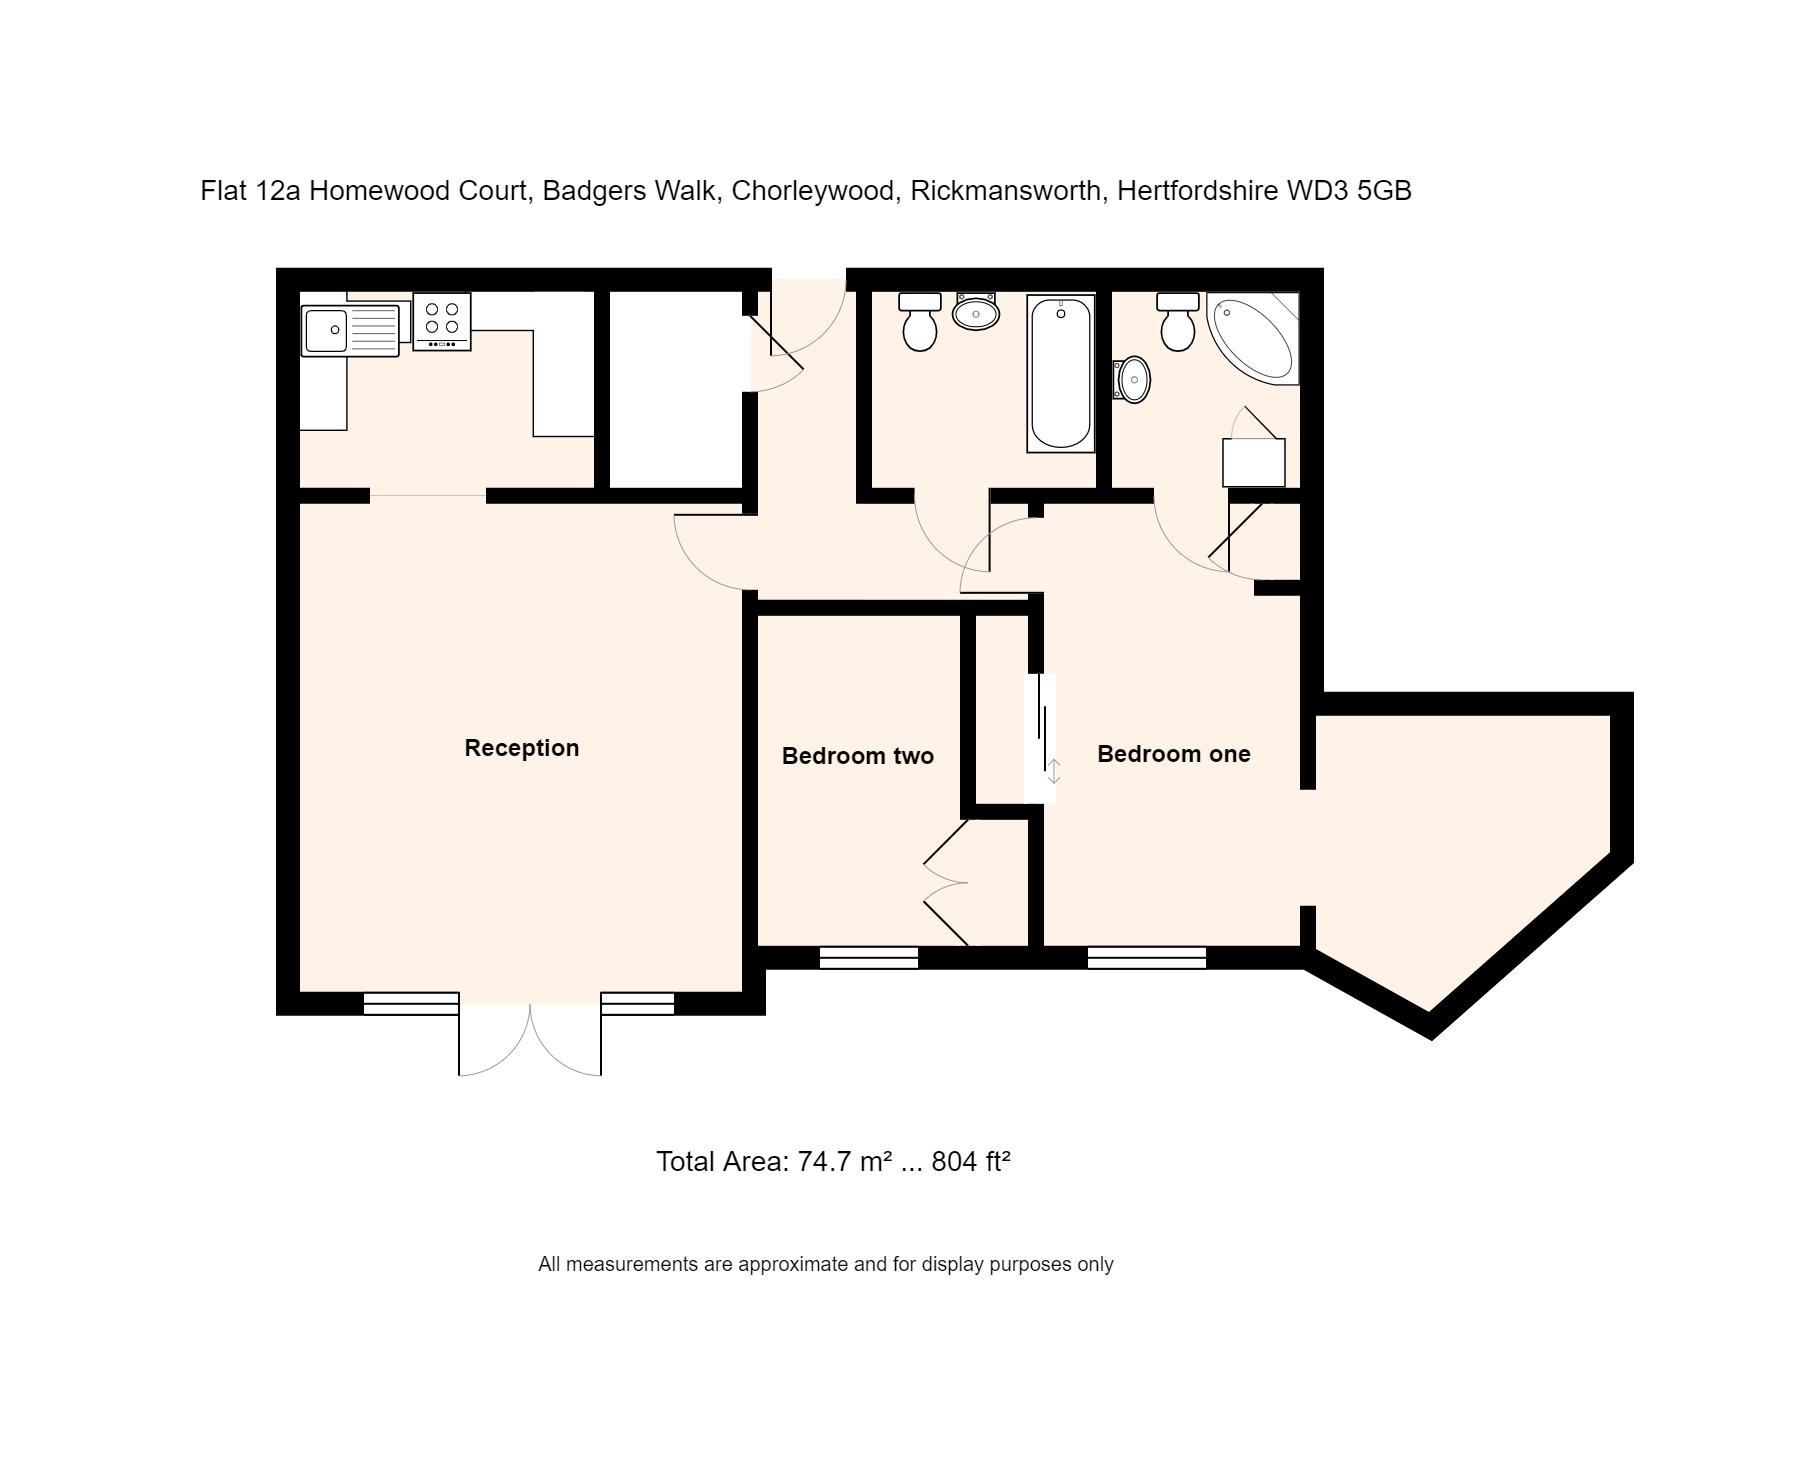 12a Homewood Court Floorplan